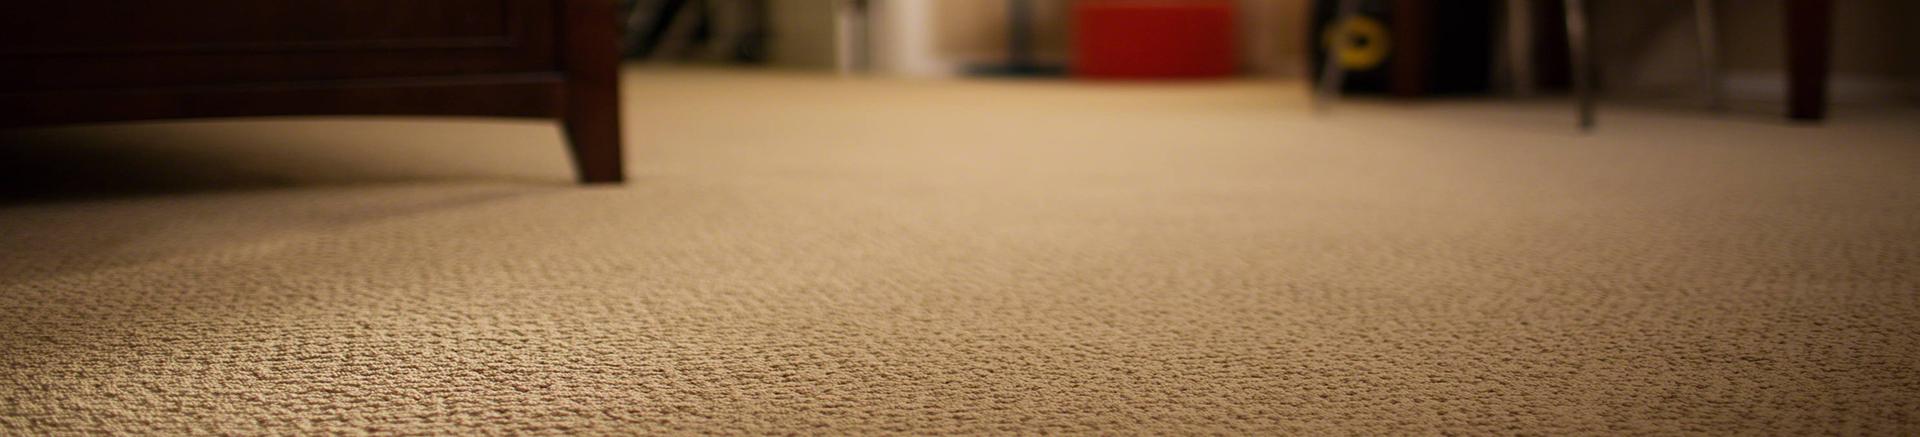 Screen plus costa rica soluciones decorativas alfombras - Cubre piso alfombra ...